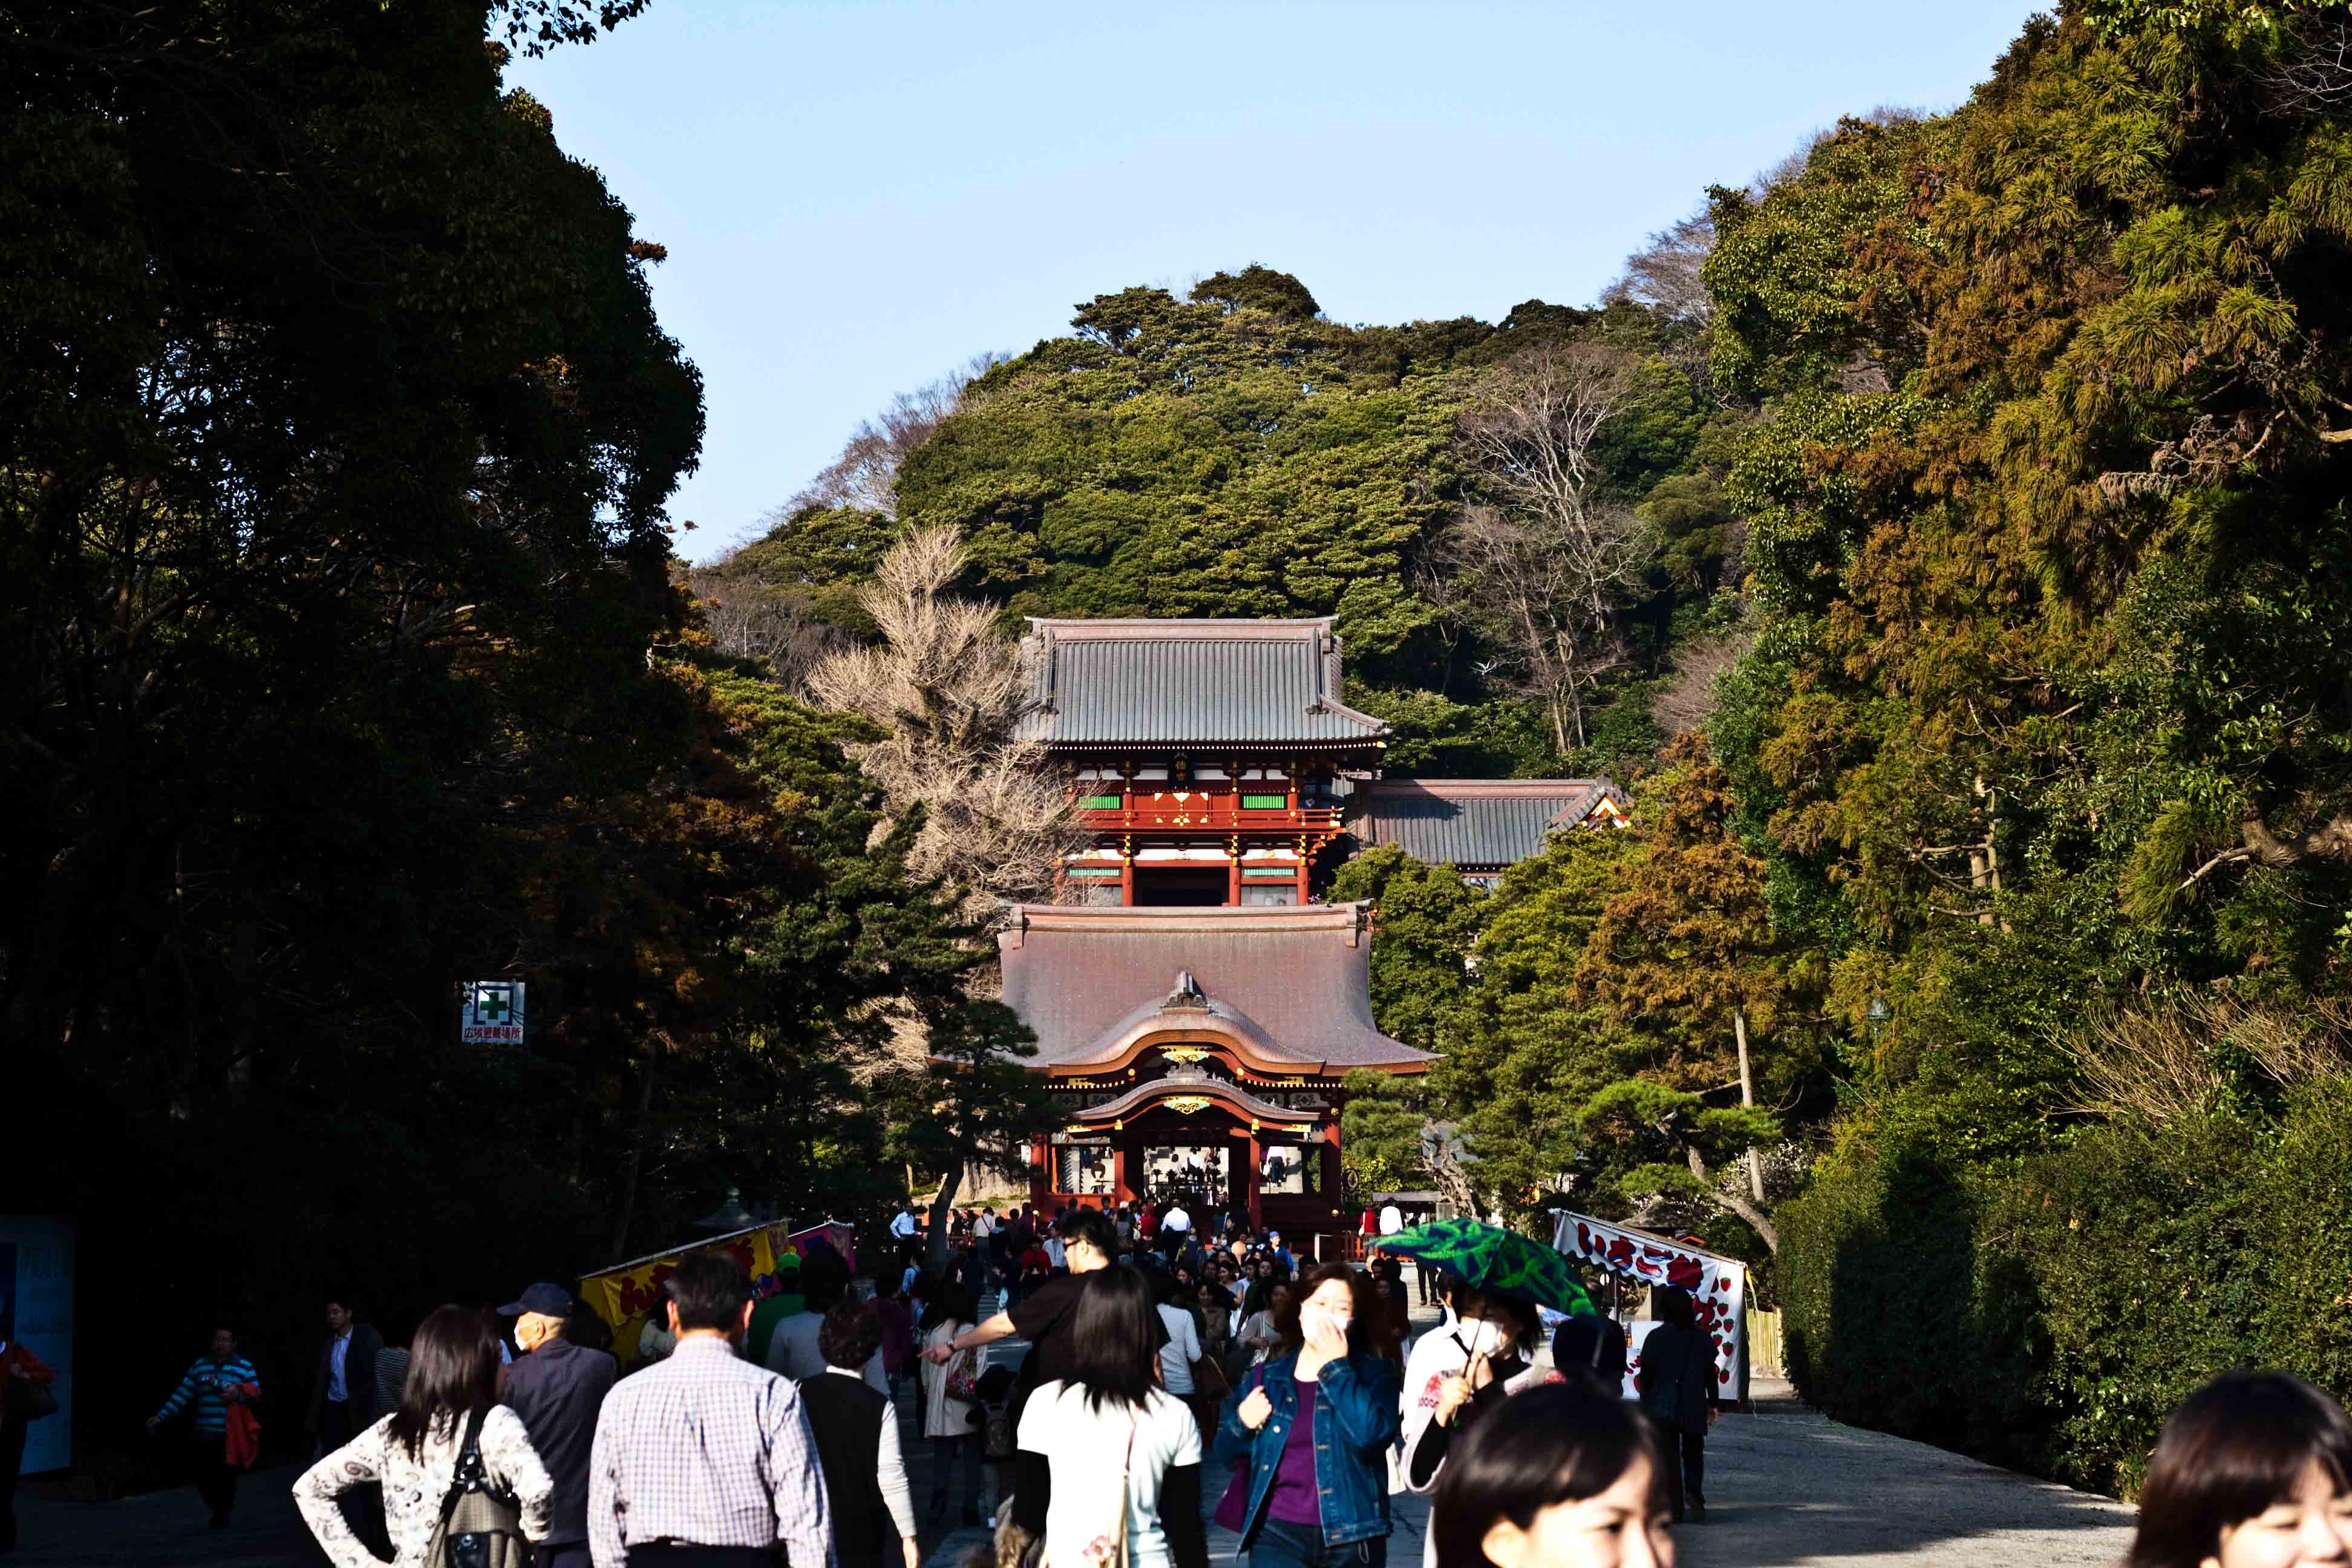 鎌倉 Kamakura #8